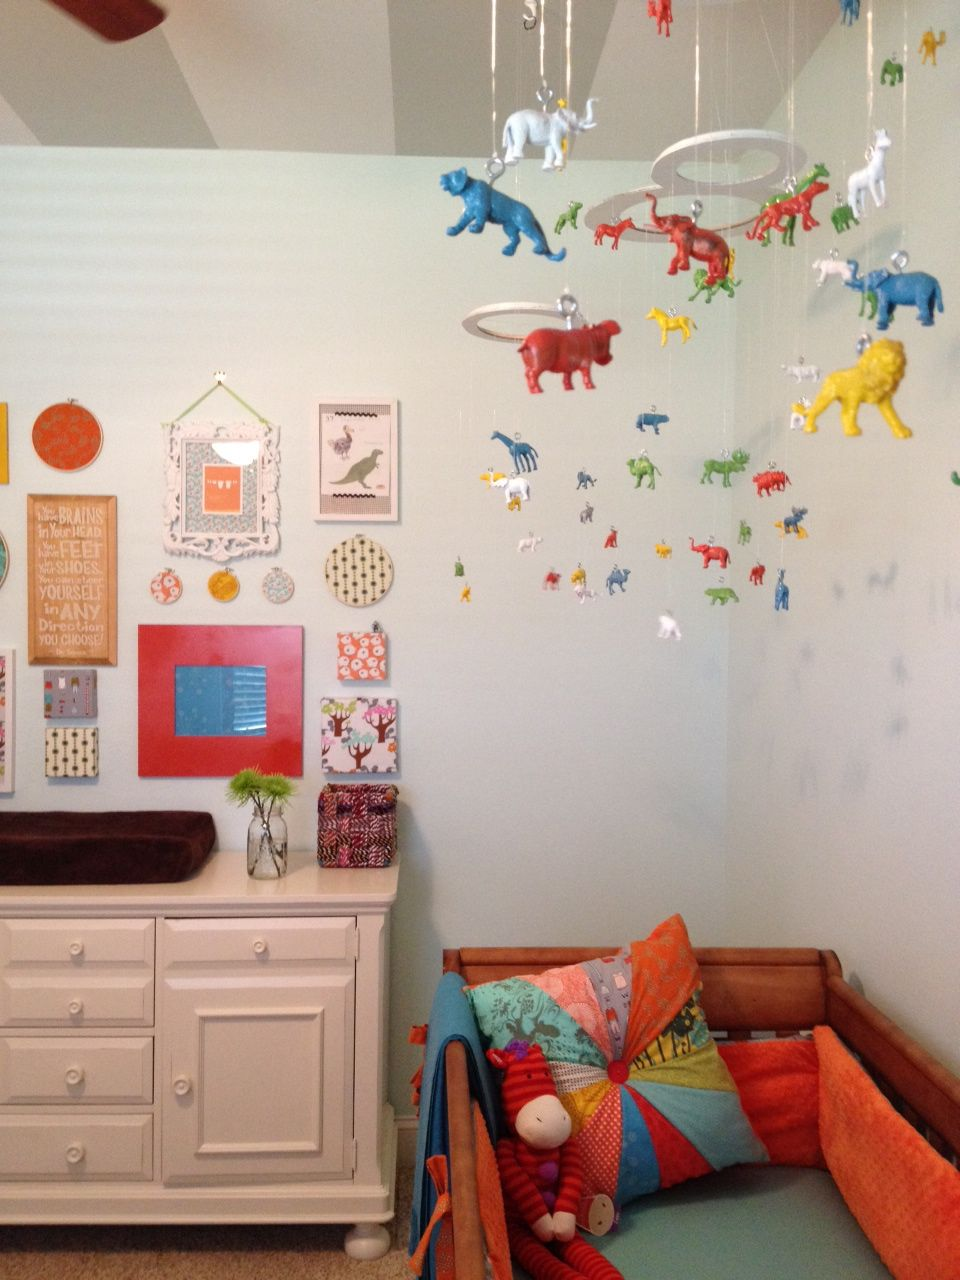 Pin by Laura Keener on Little Ones   Diy baby stuff, Room diy ...